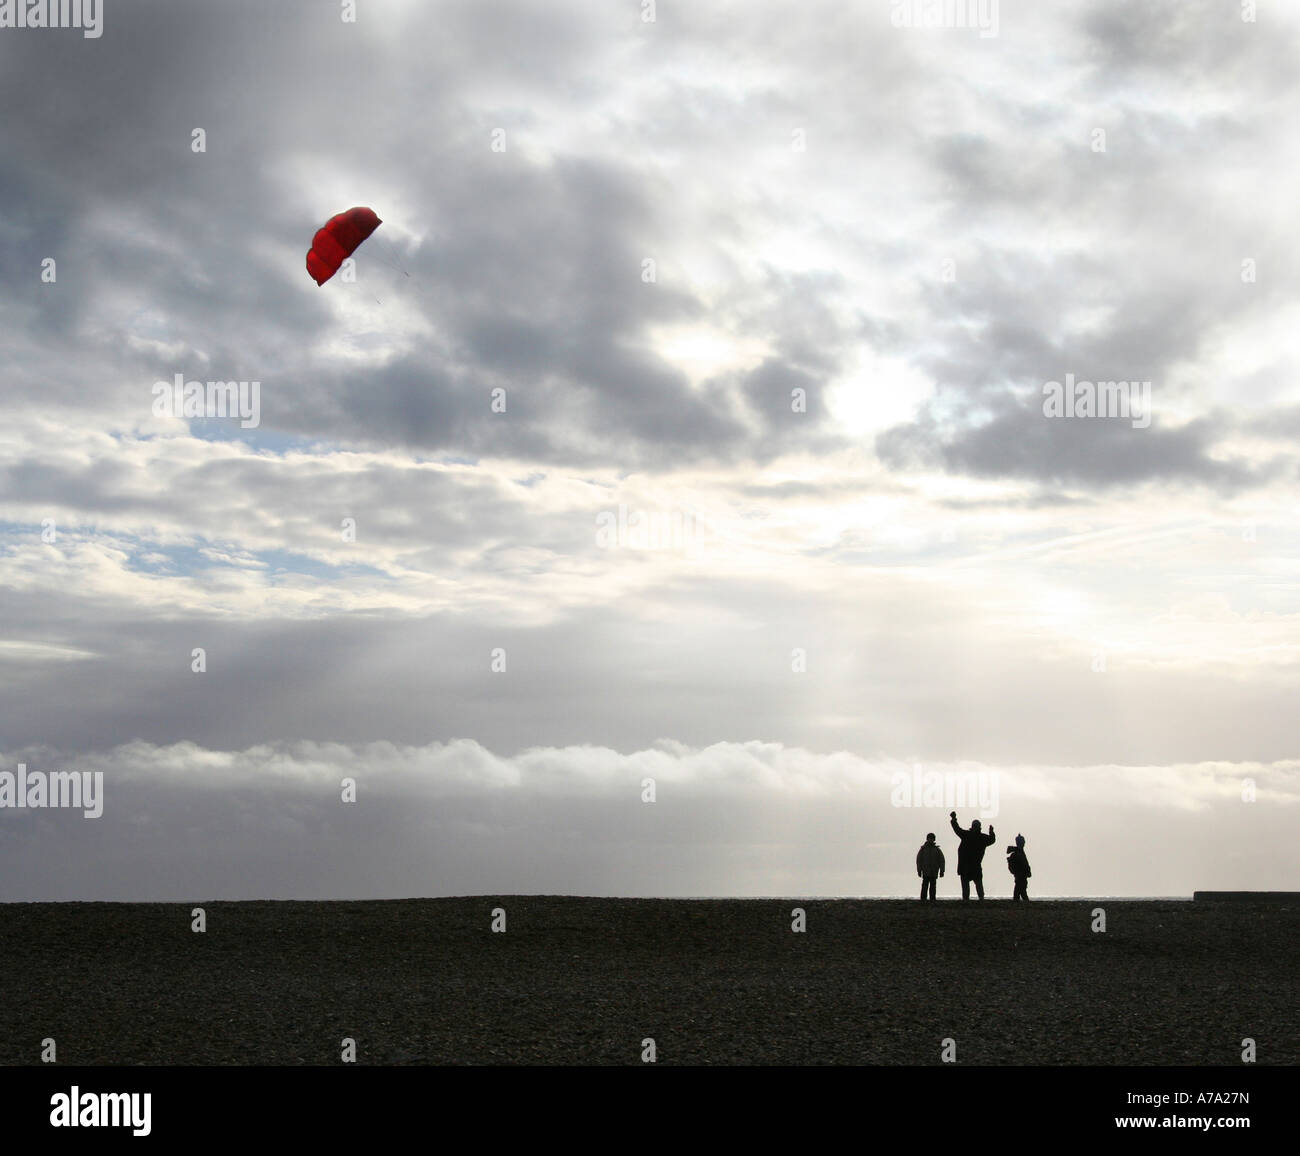 Kite flying on Brighton beach - Stock Image